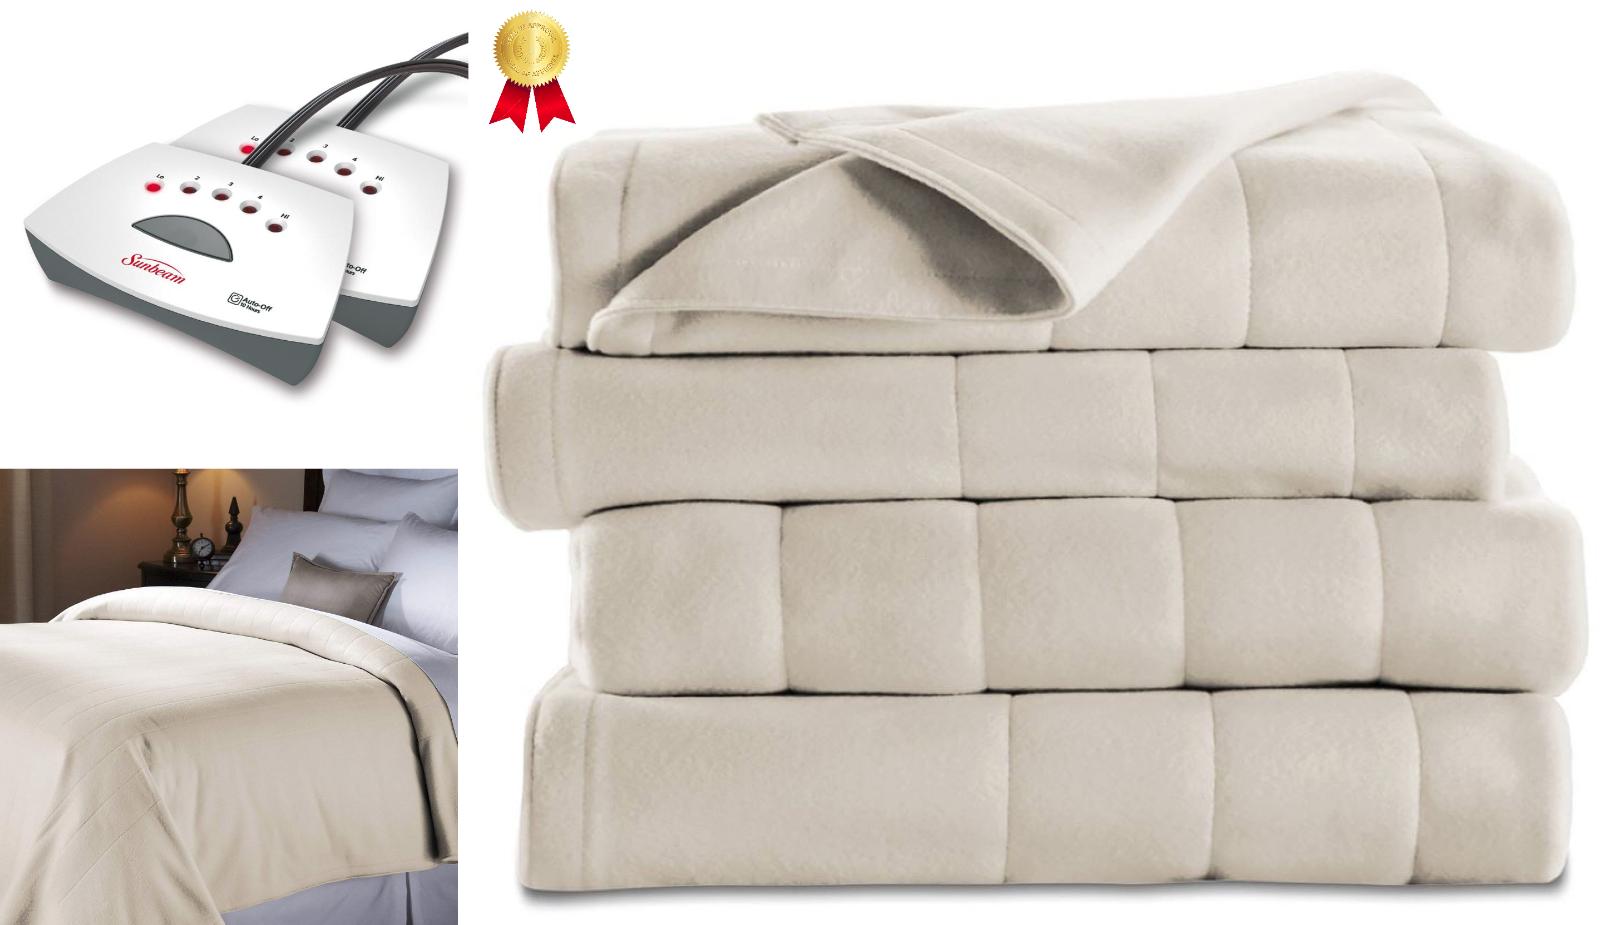 Queen Size Electric Heated Fleece Blanket Cozy Warm Extra So